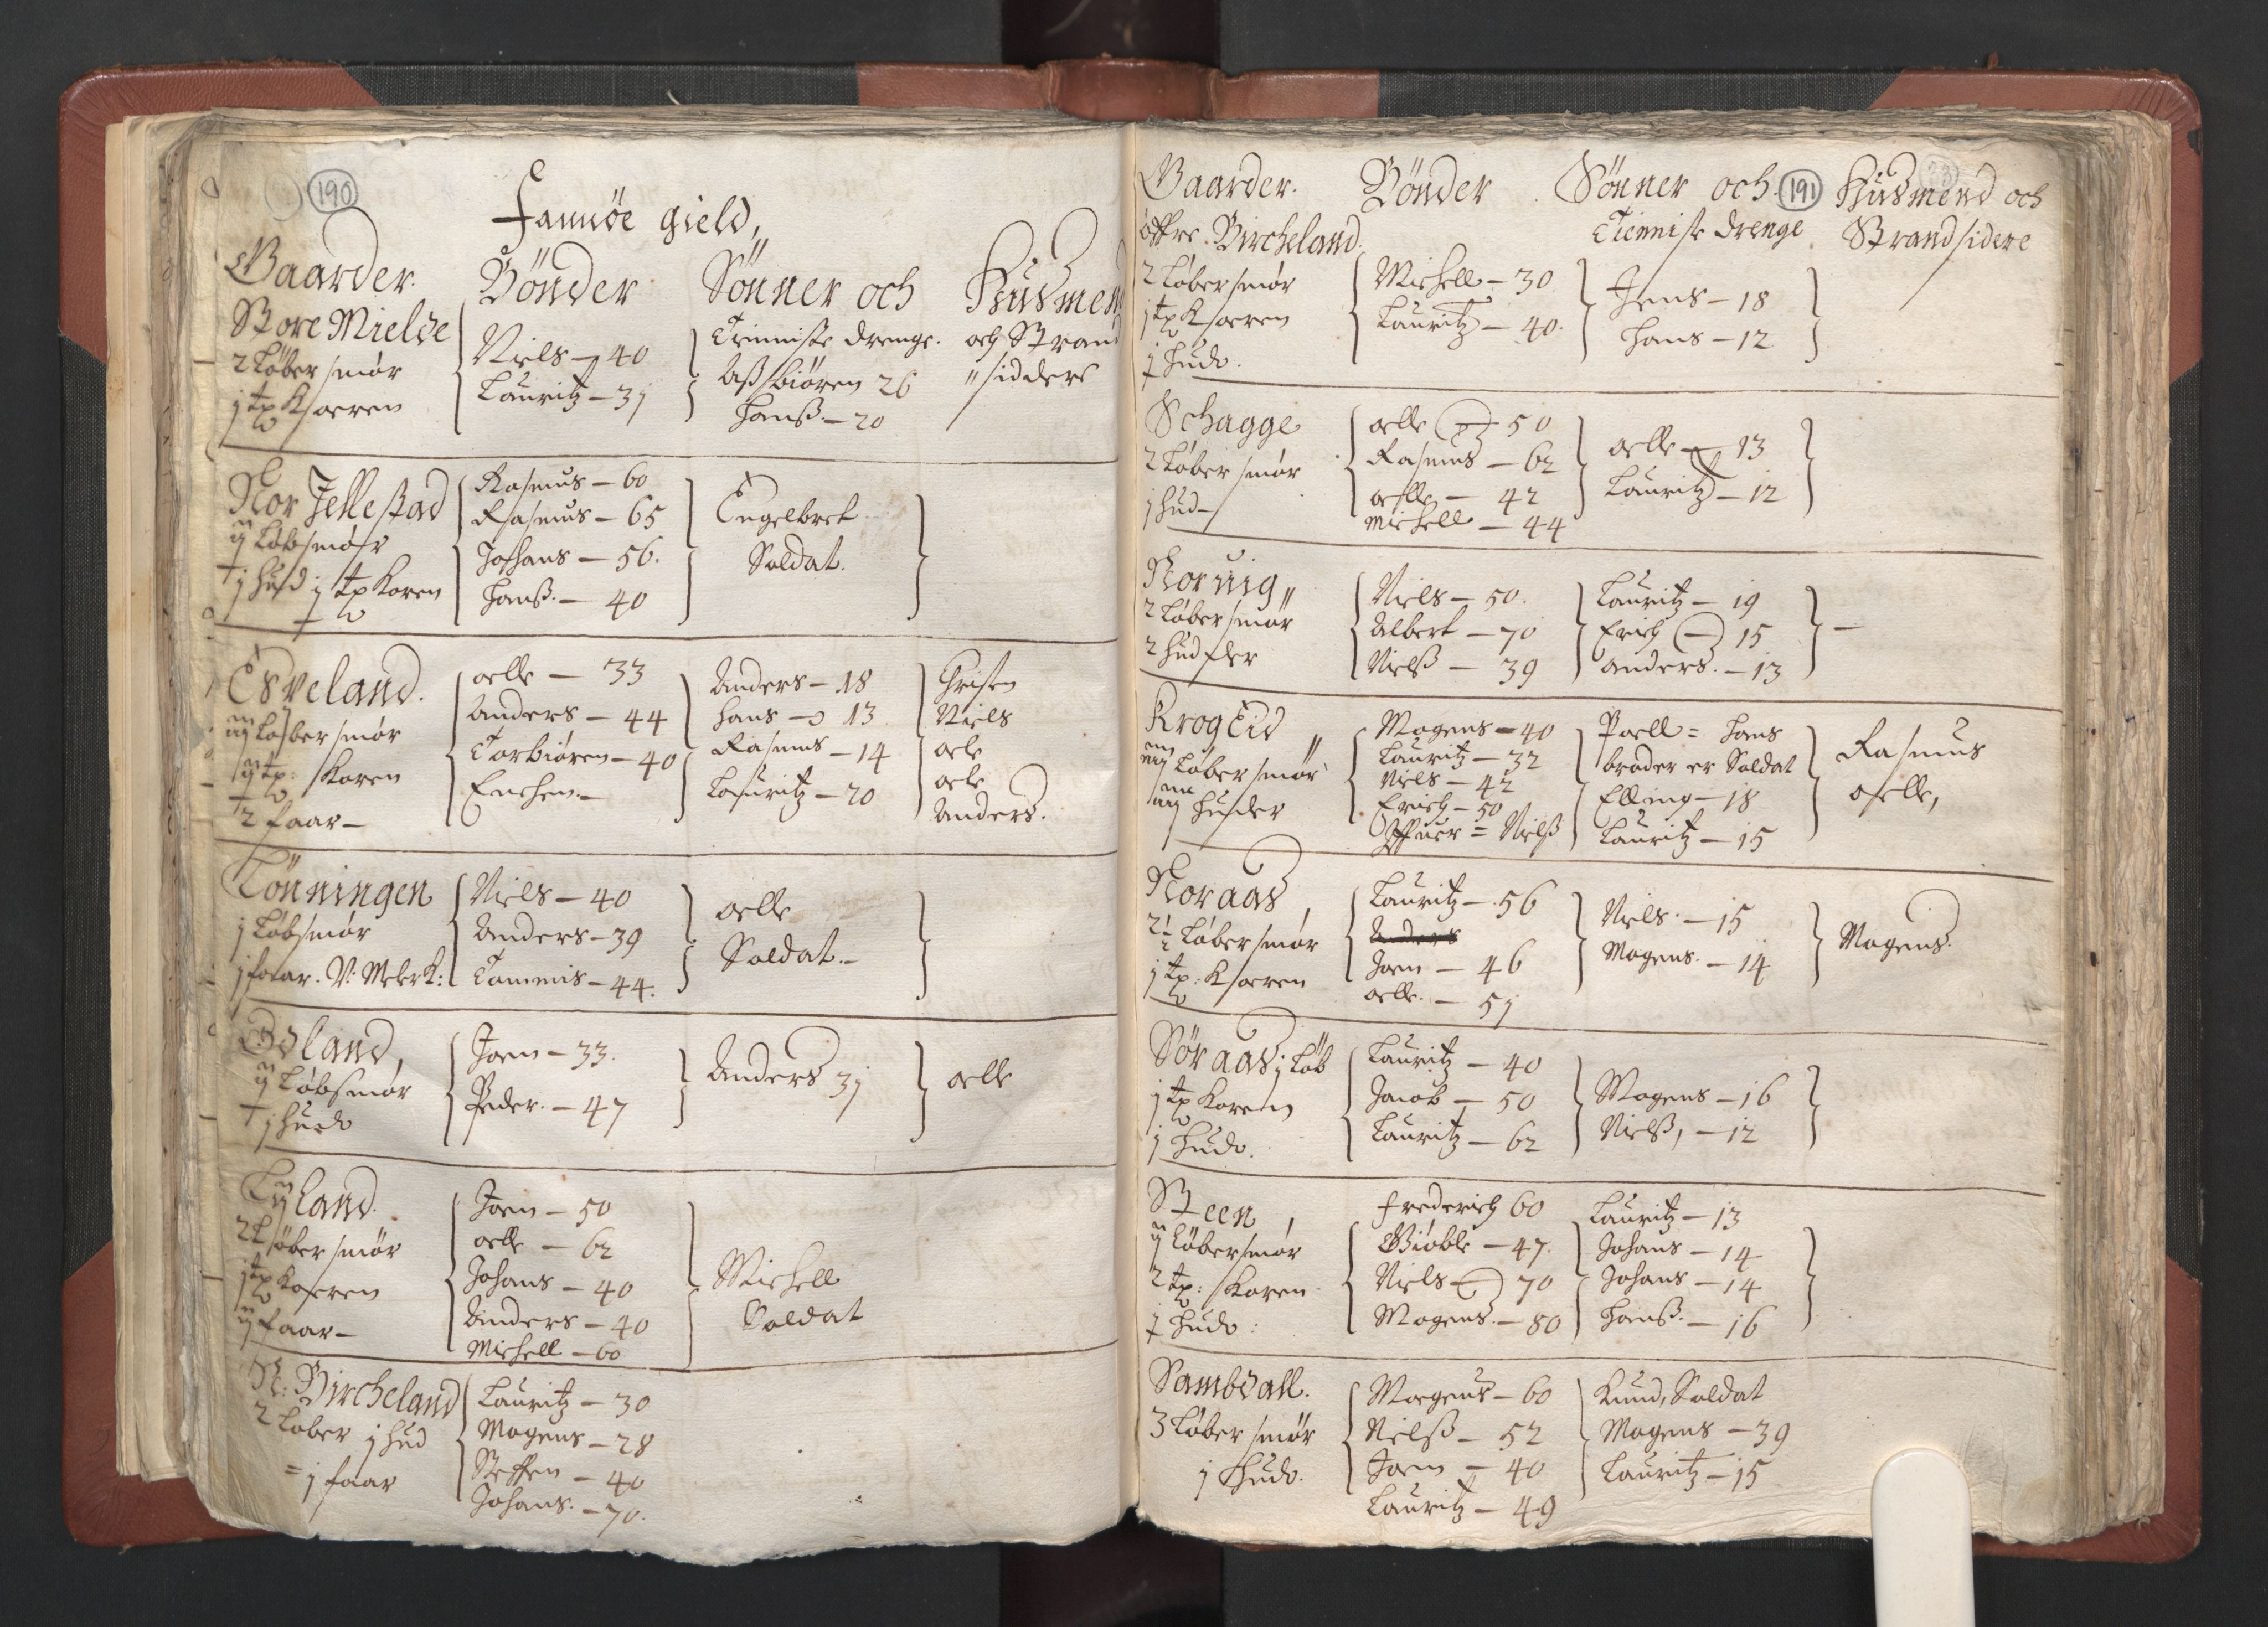 RA, Fogdenes og sorenskrivernes manntall 1664-1666, nr. 13: Nordhordland fogderi og Sunnhordland fogderi, 1665, s. 190-191